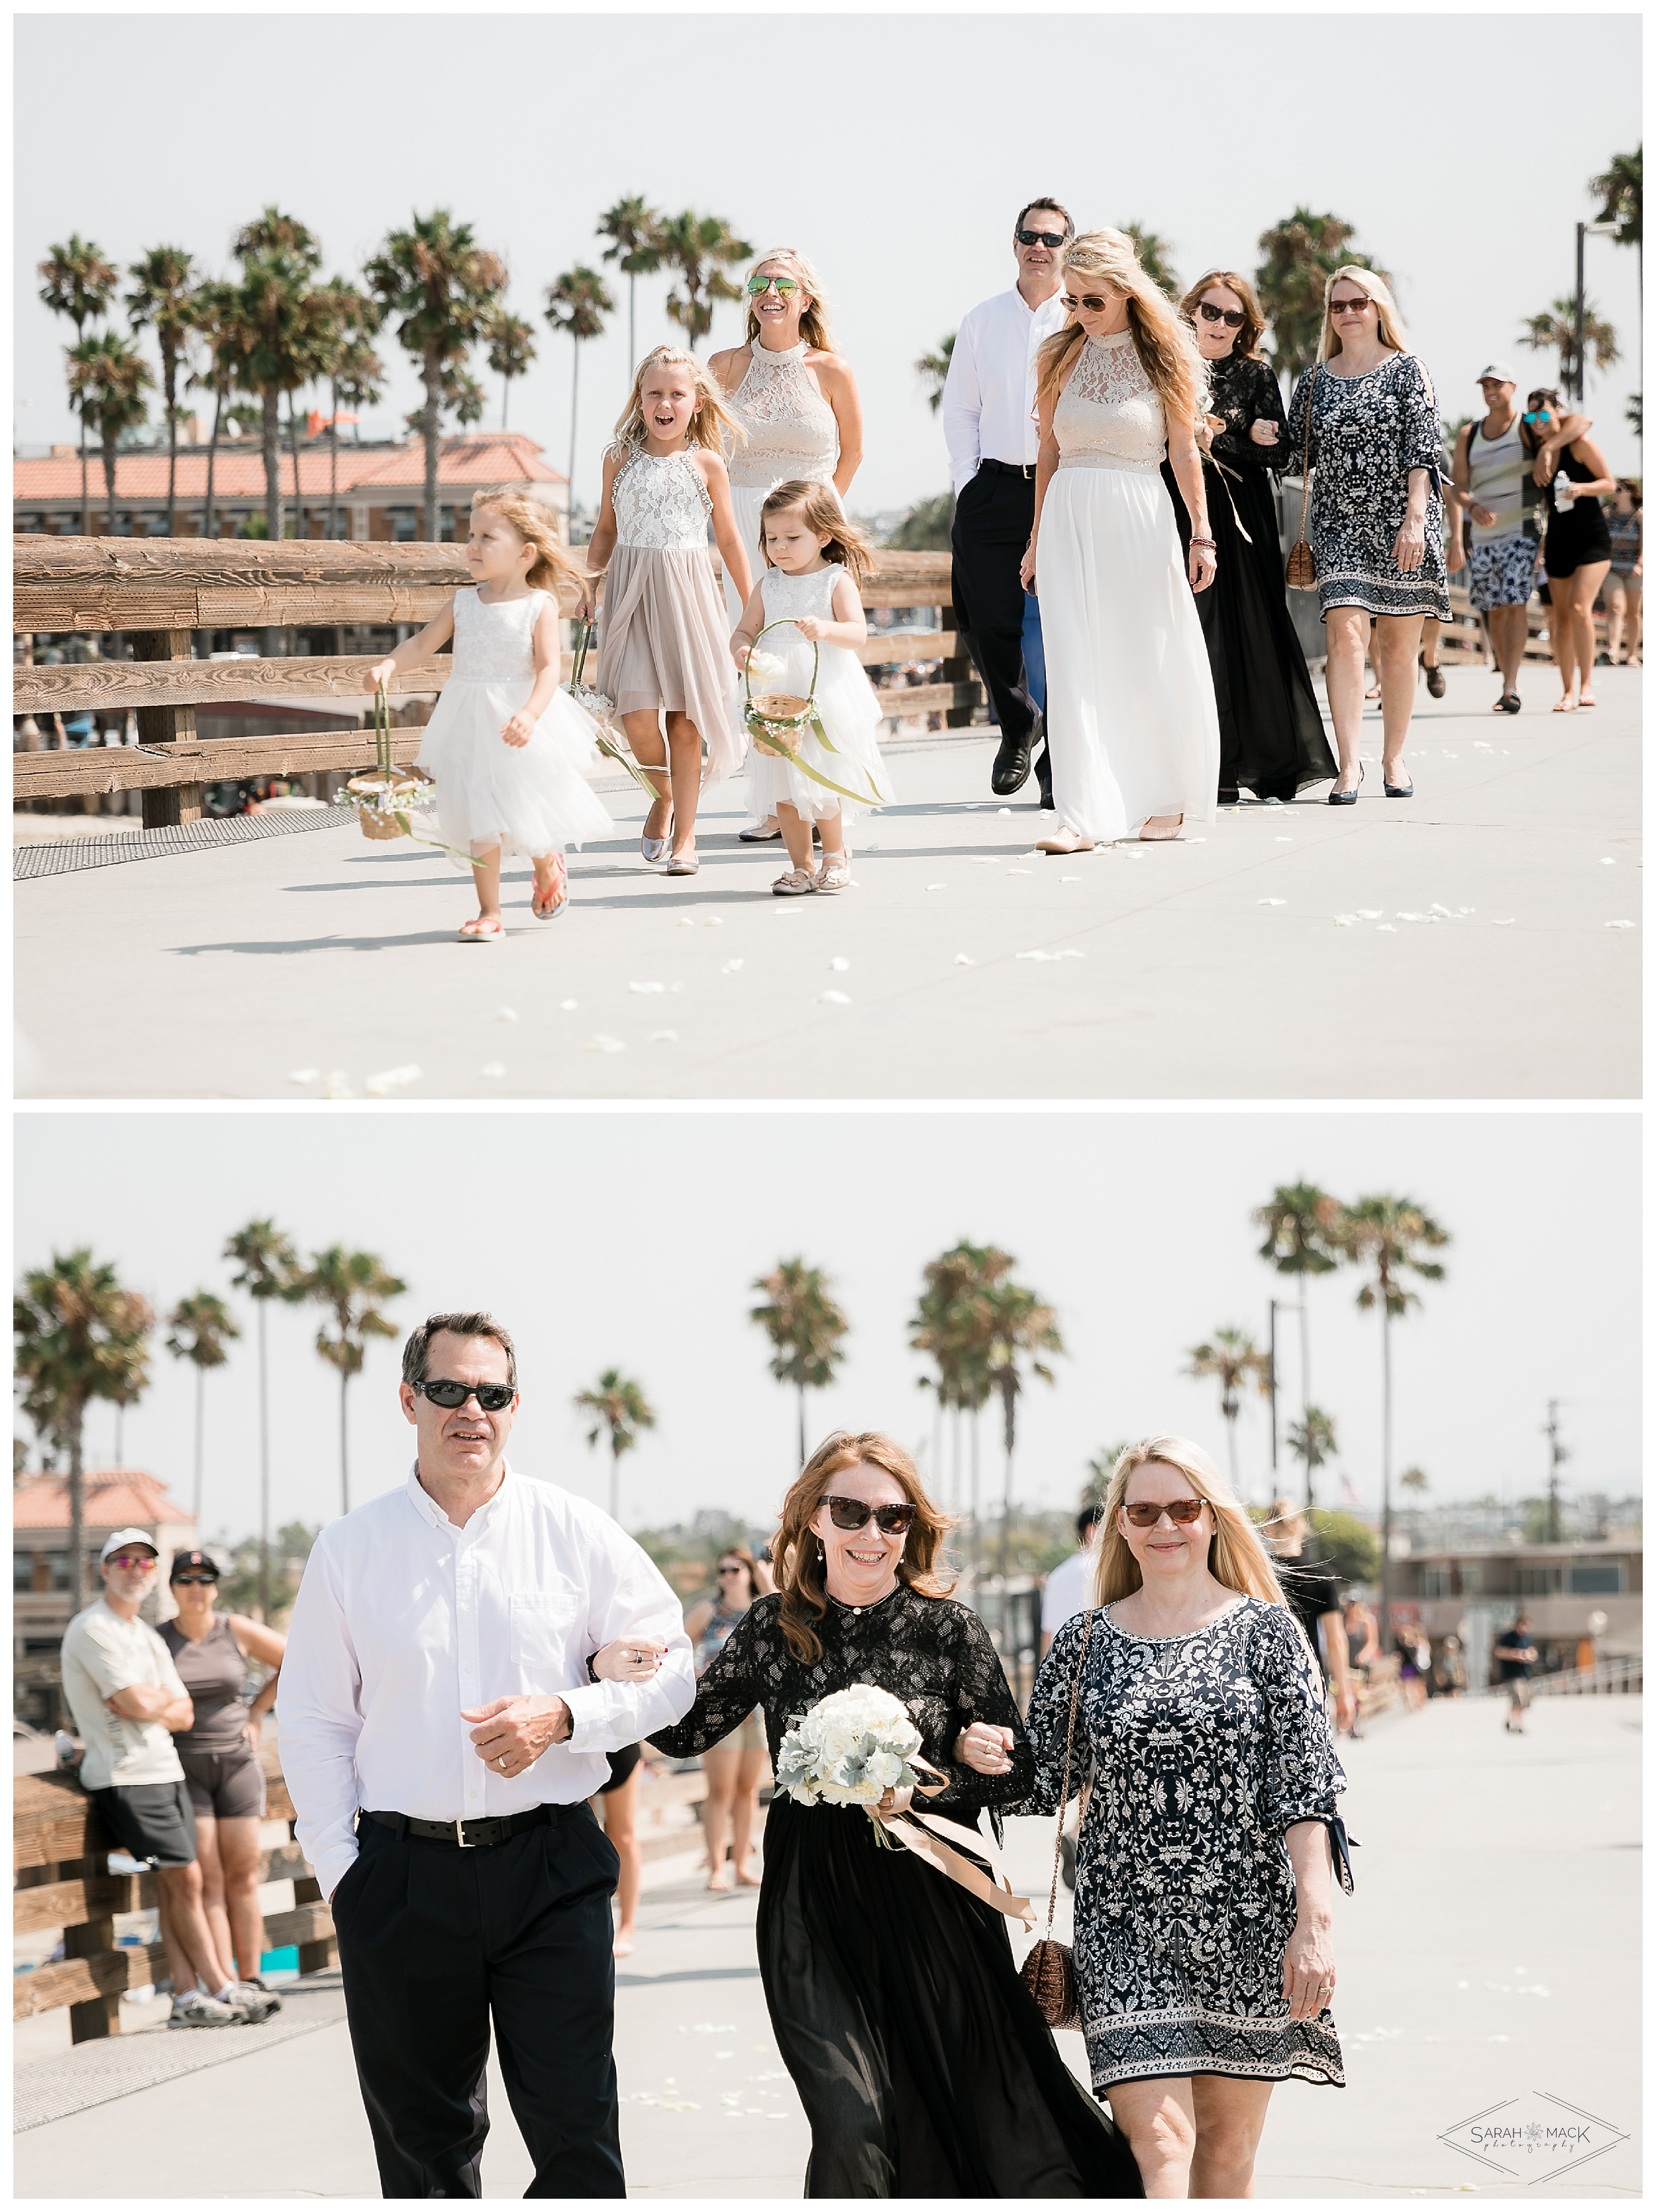 LM-Newport-Beach-Pier-Intimate-Wedding-Photography 63.jpg